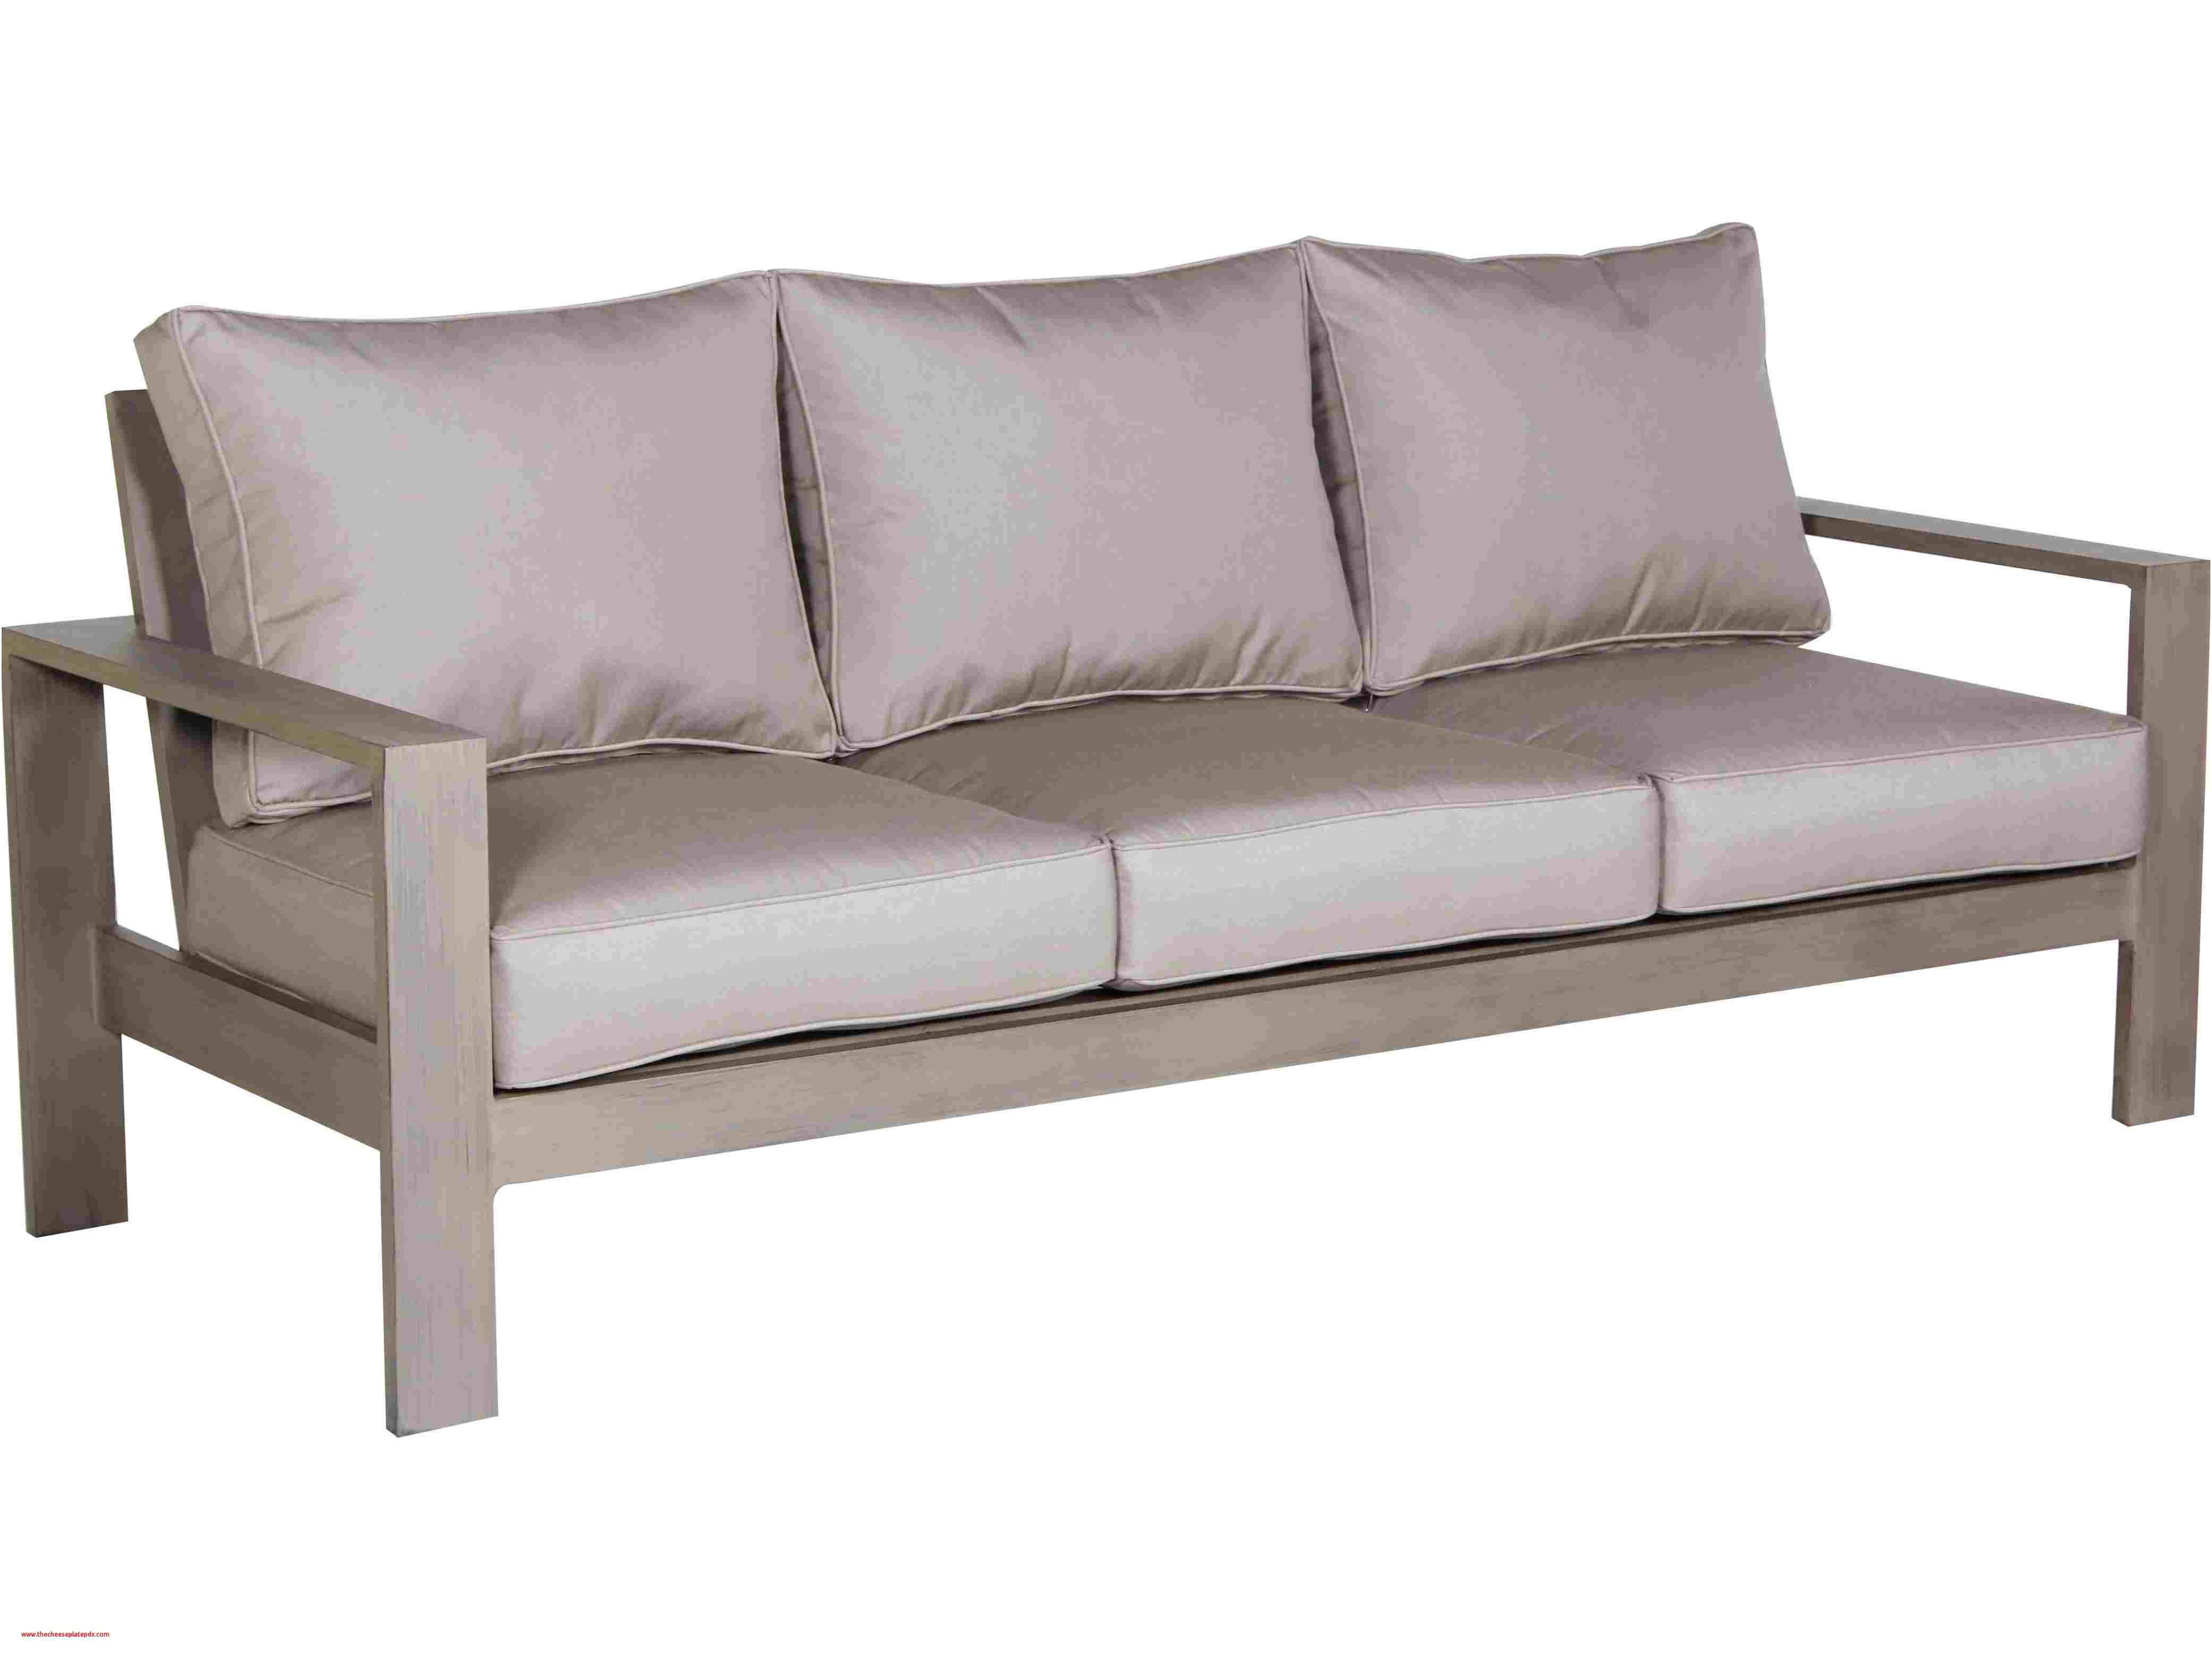 Aufblasbares Sofa  Aufblasbares sofa Ikea Sessel Aufblasbar Ikea – Schtimm